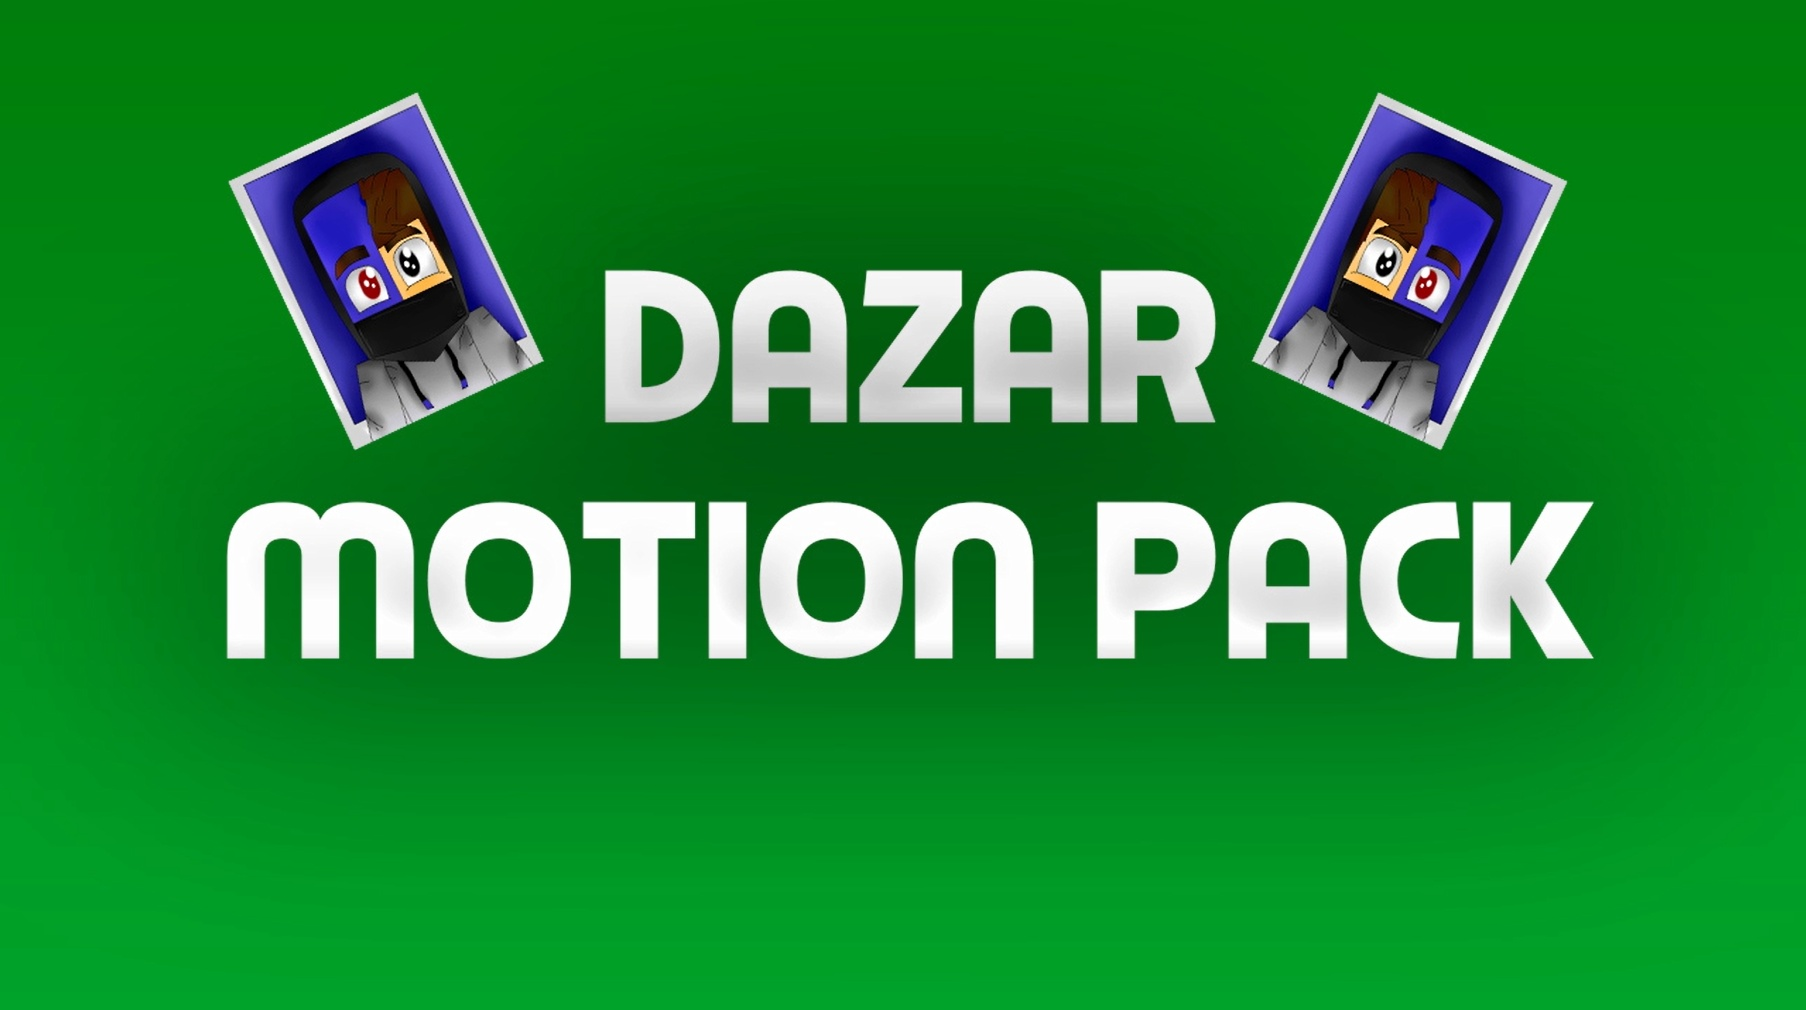 MOTION PACK BY DAZAR ARTS